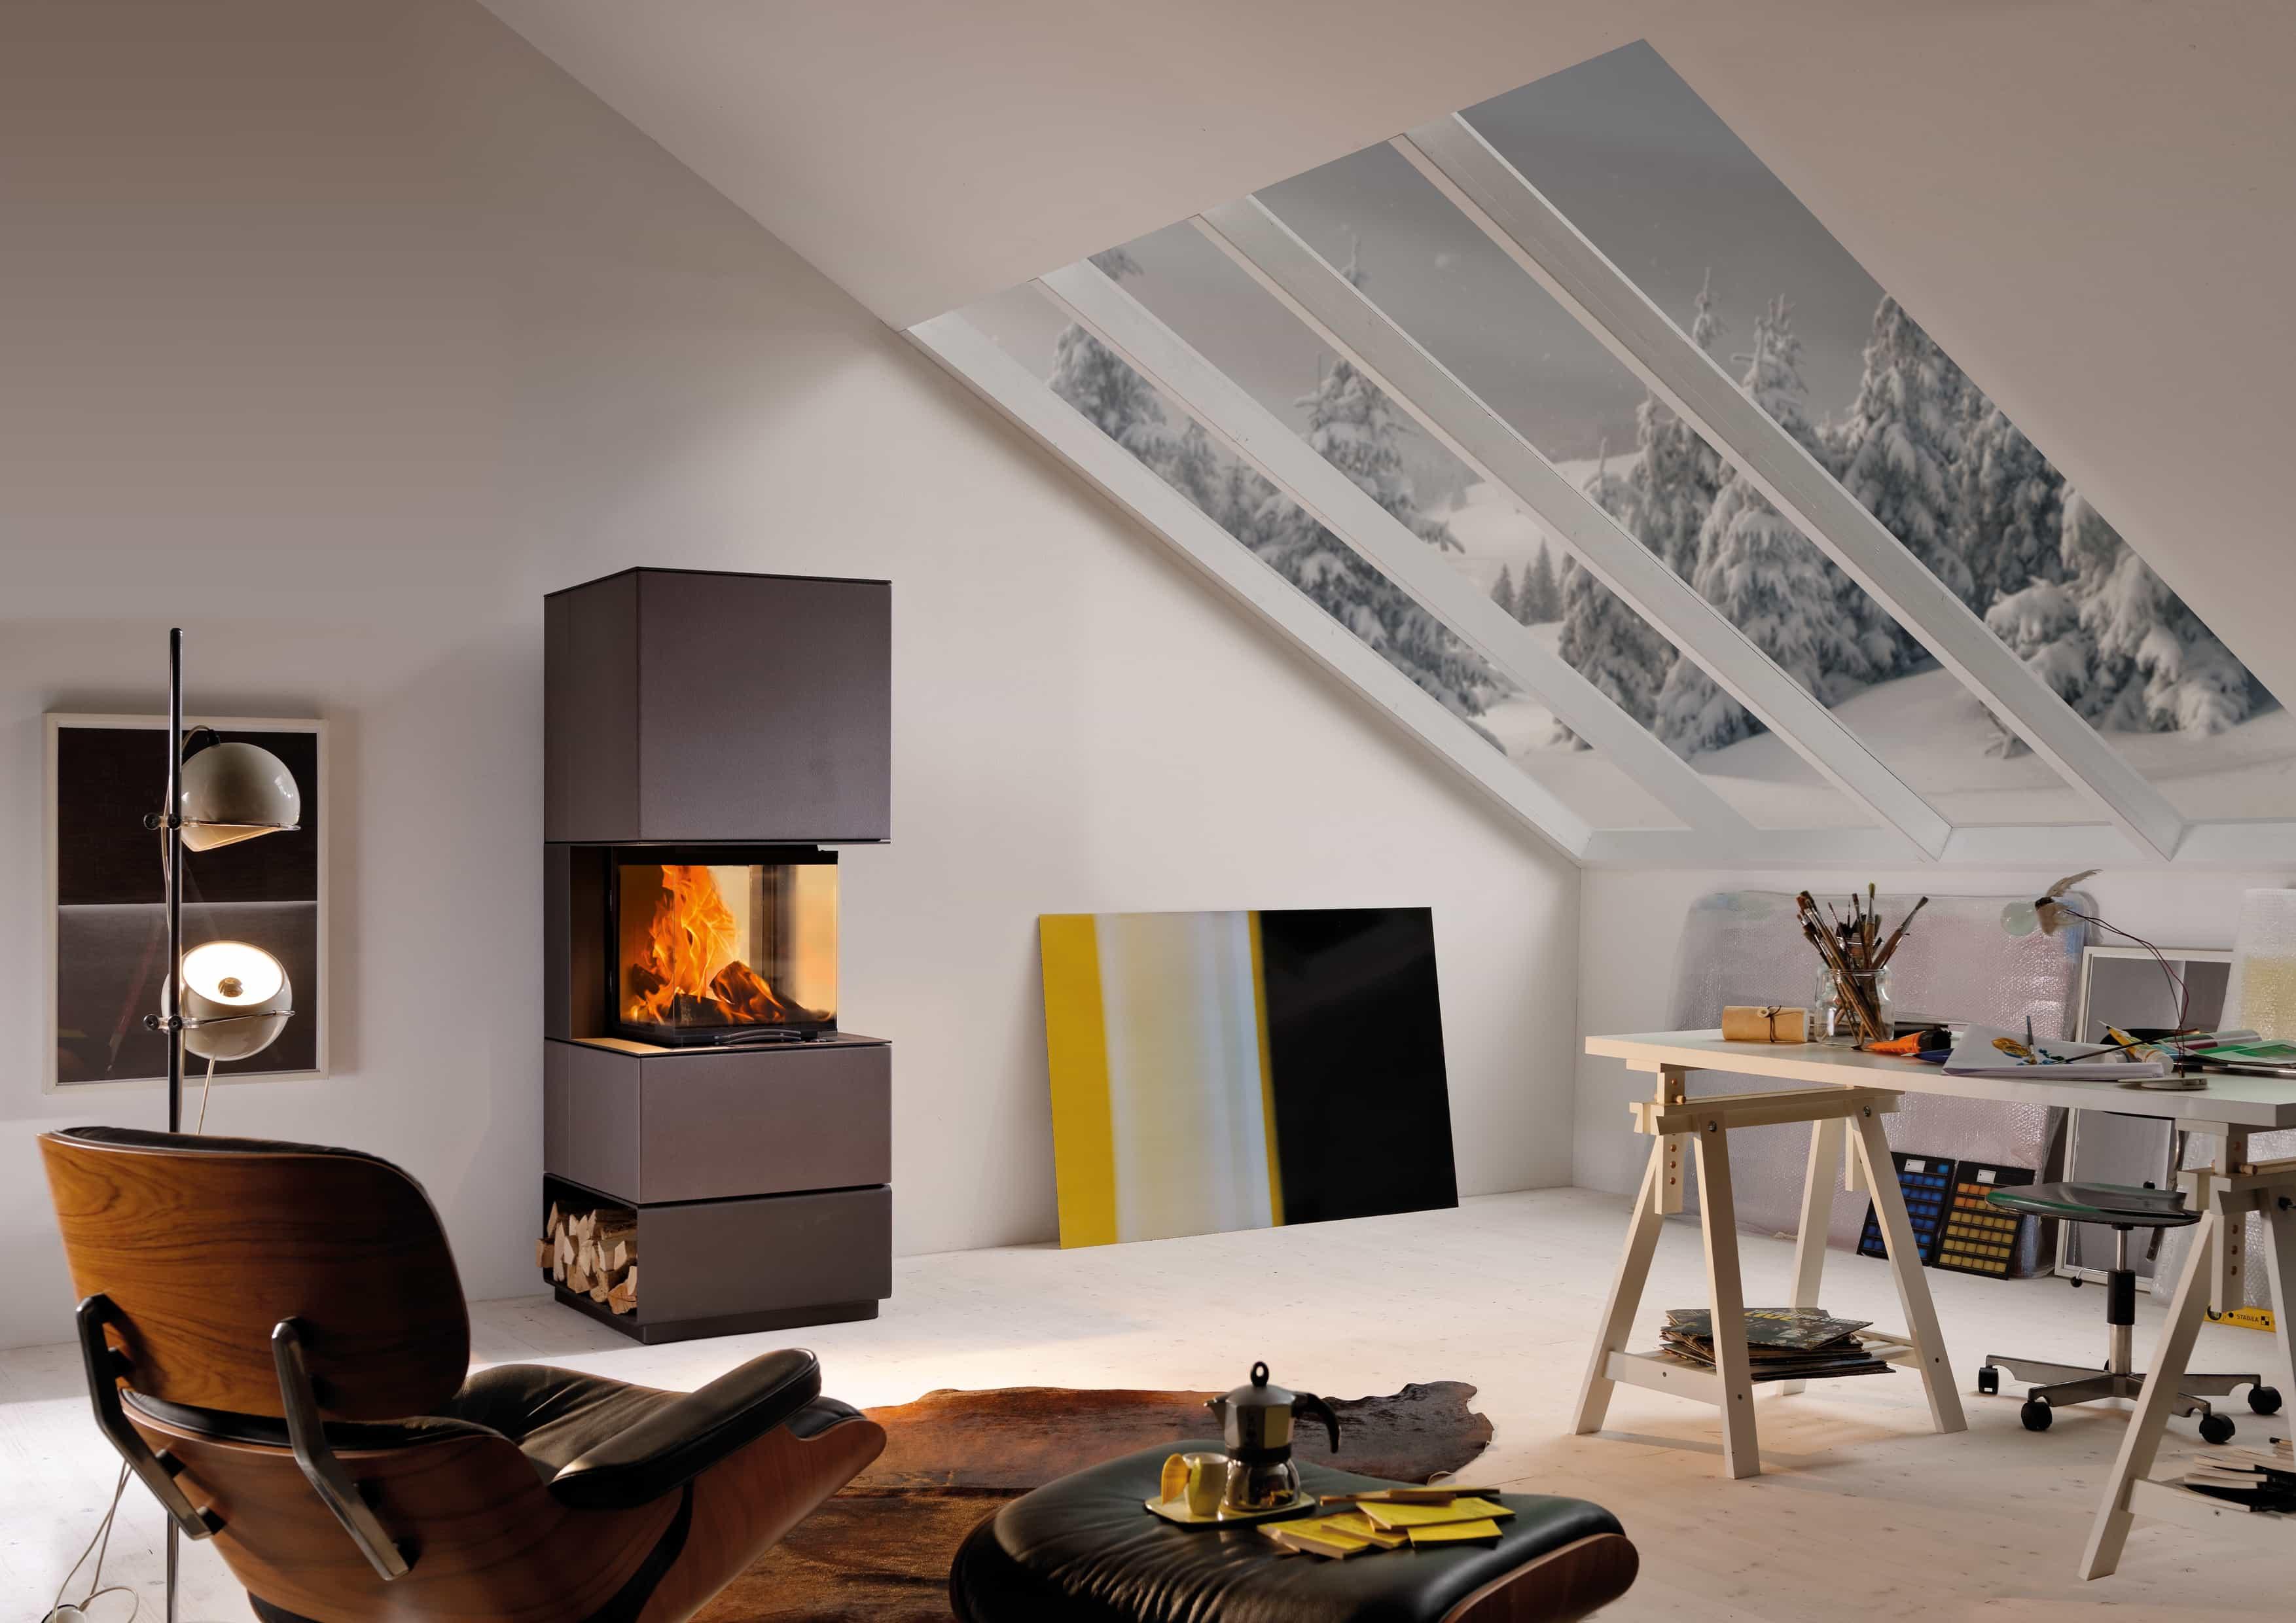 designkamin mel von austroflamm lto ofenbau. Black Bedroom Furniture Sets. Home Design Ideas